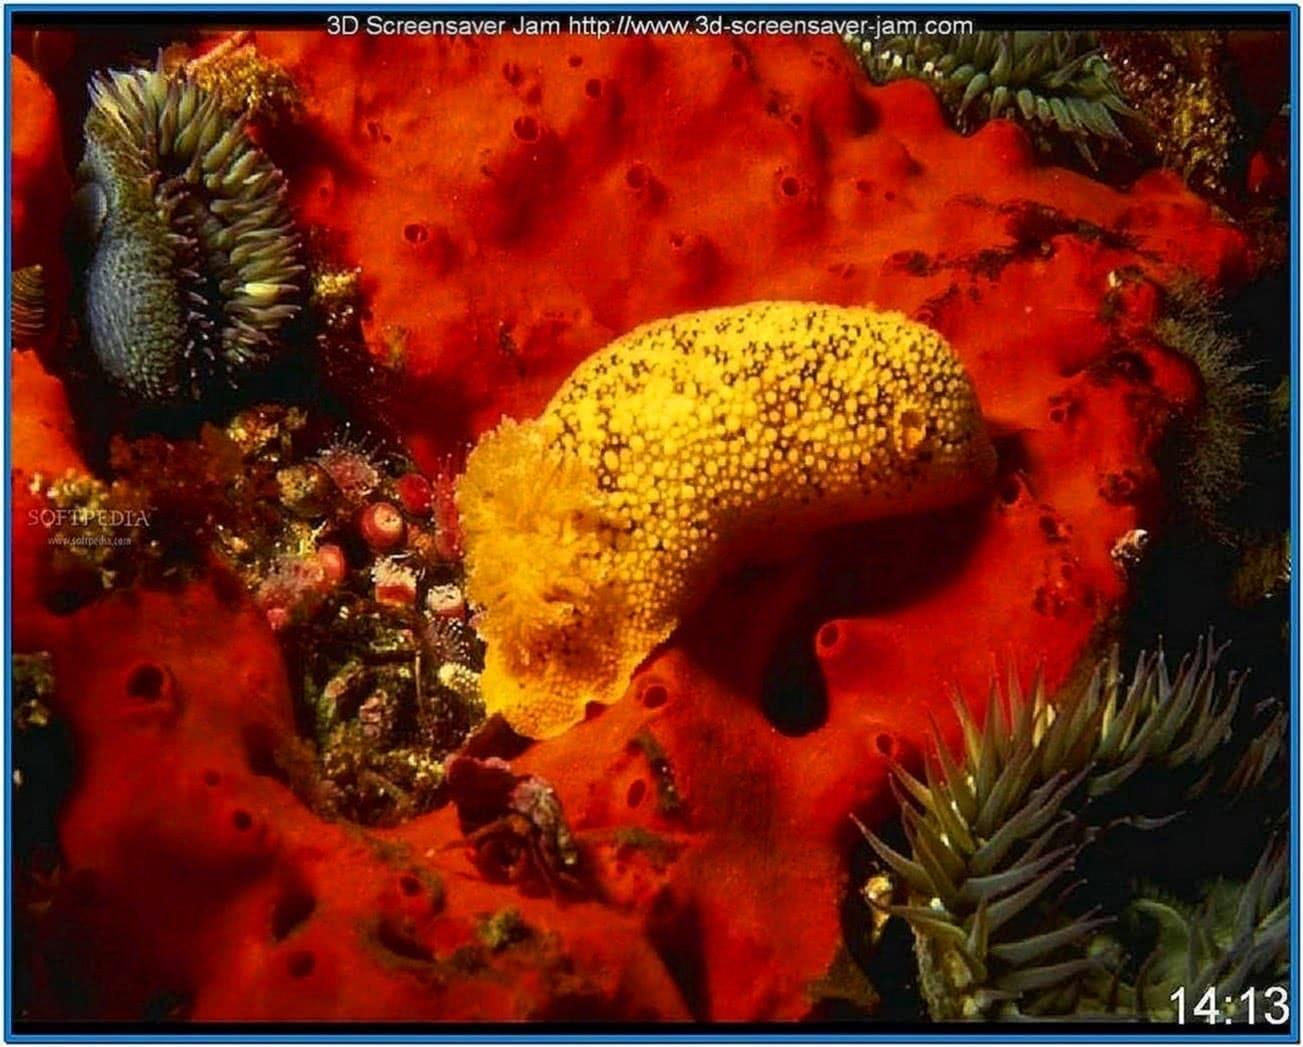 Underwater World Screensaver